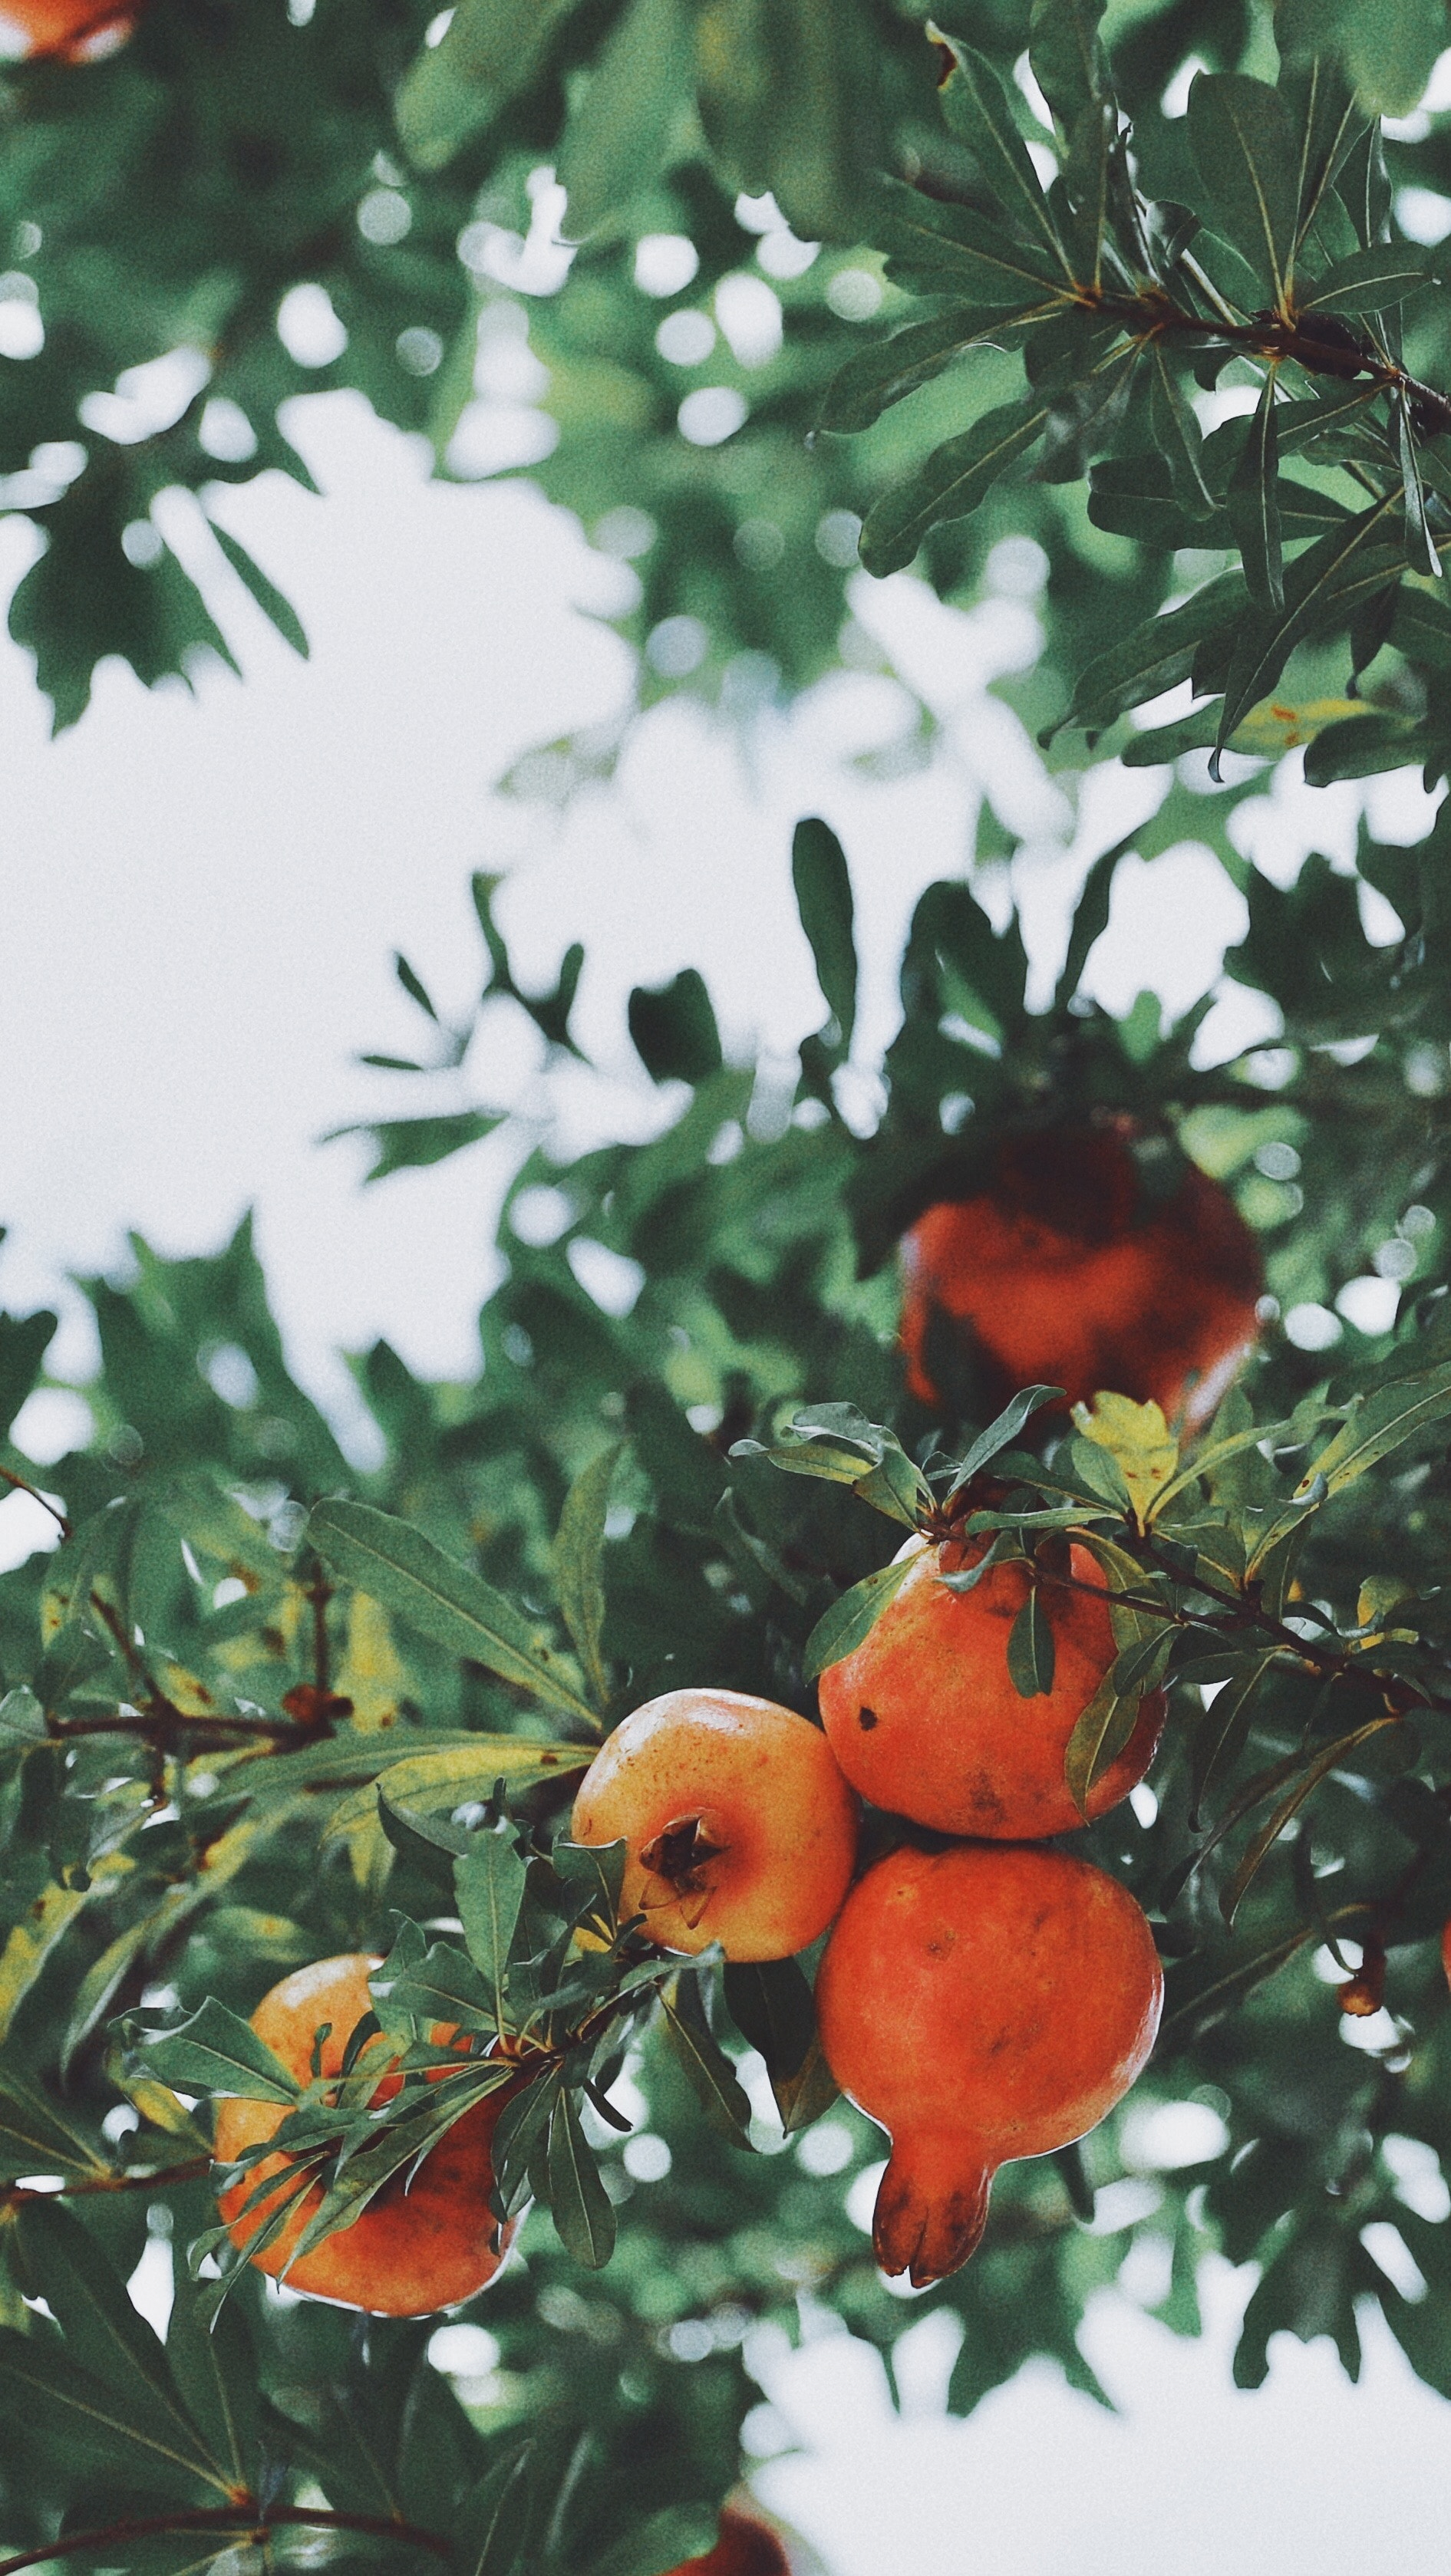 deciduous fruit trees lifestyle home garden nursery plant shop johannesburg gauteng pommes stone grow your own orchard espalier